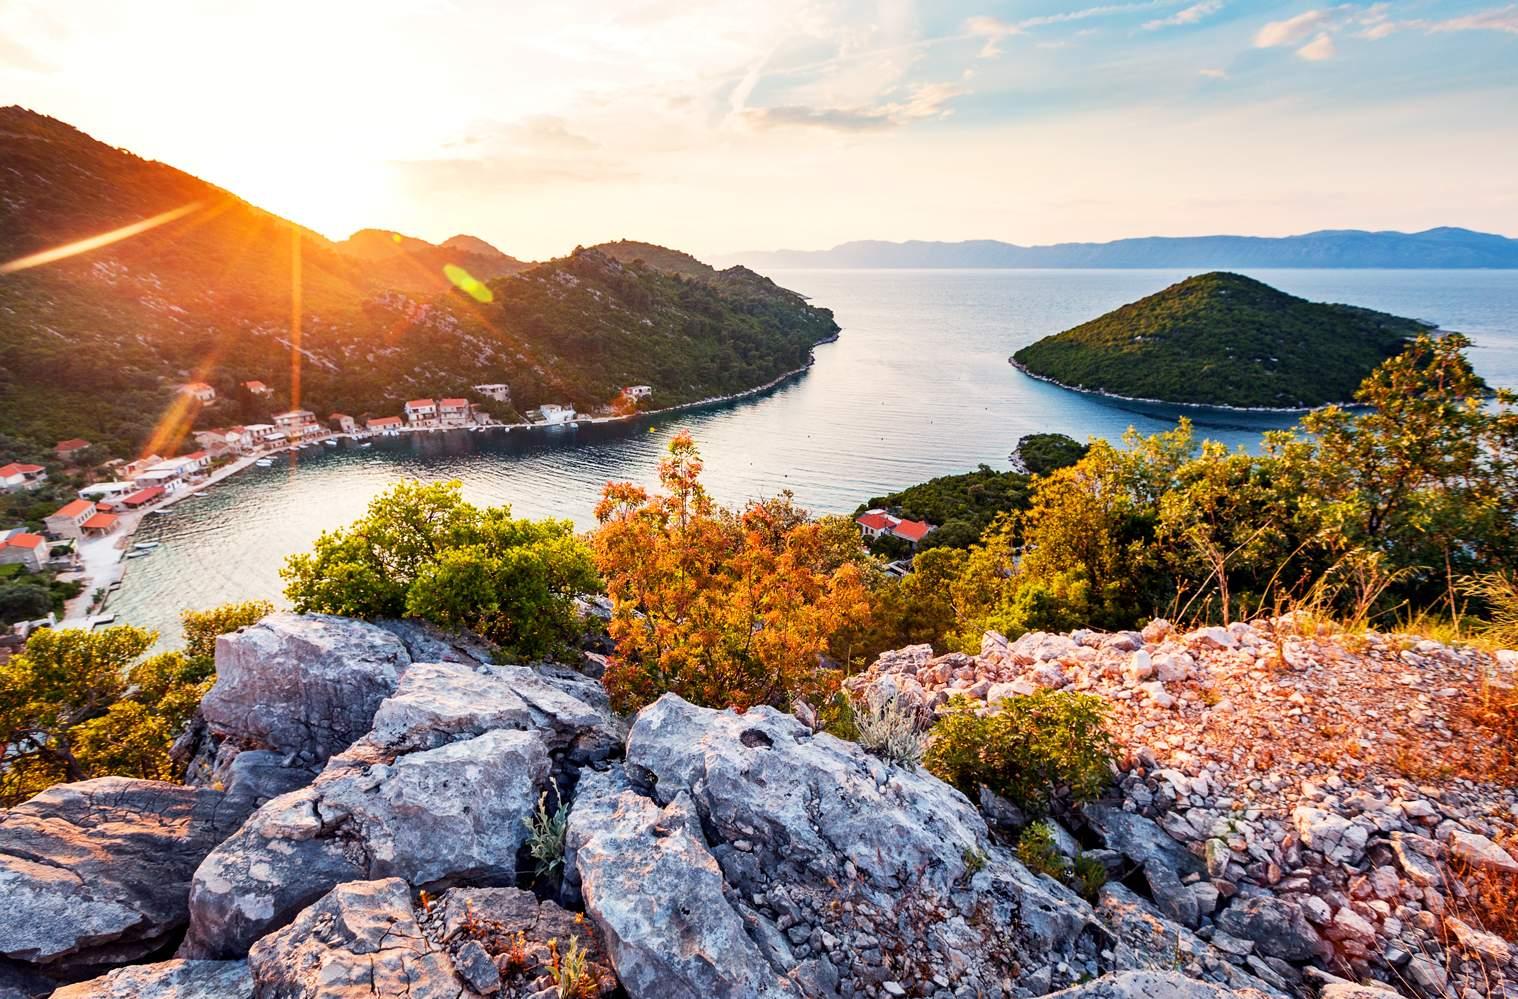 Top 10 Reasons to Visit Mljet This Summer